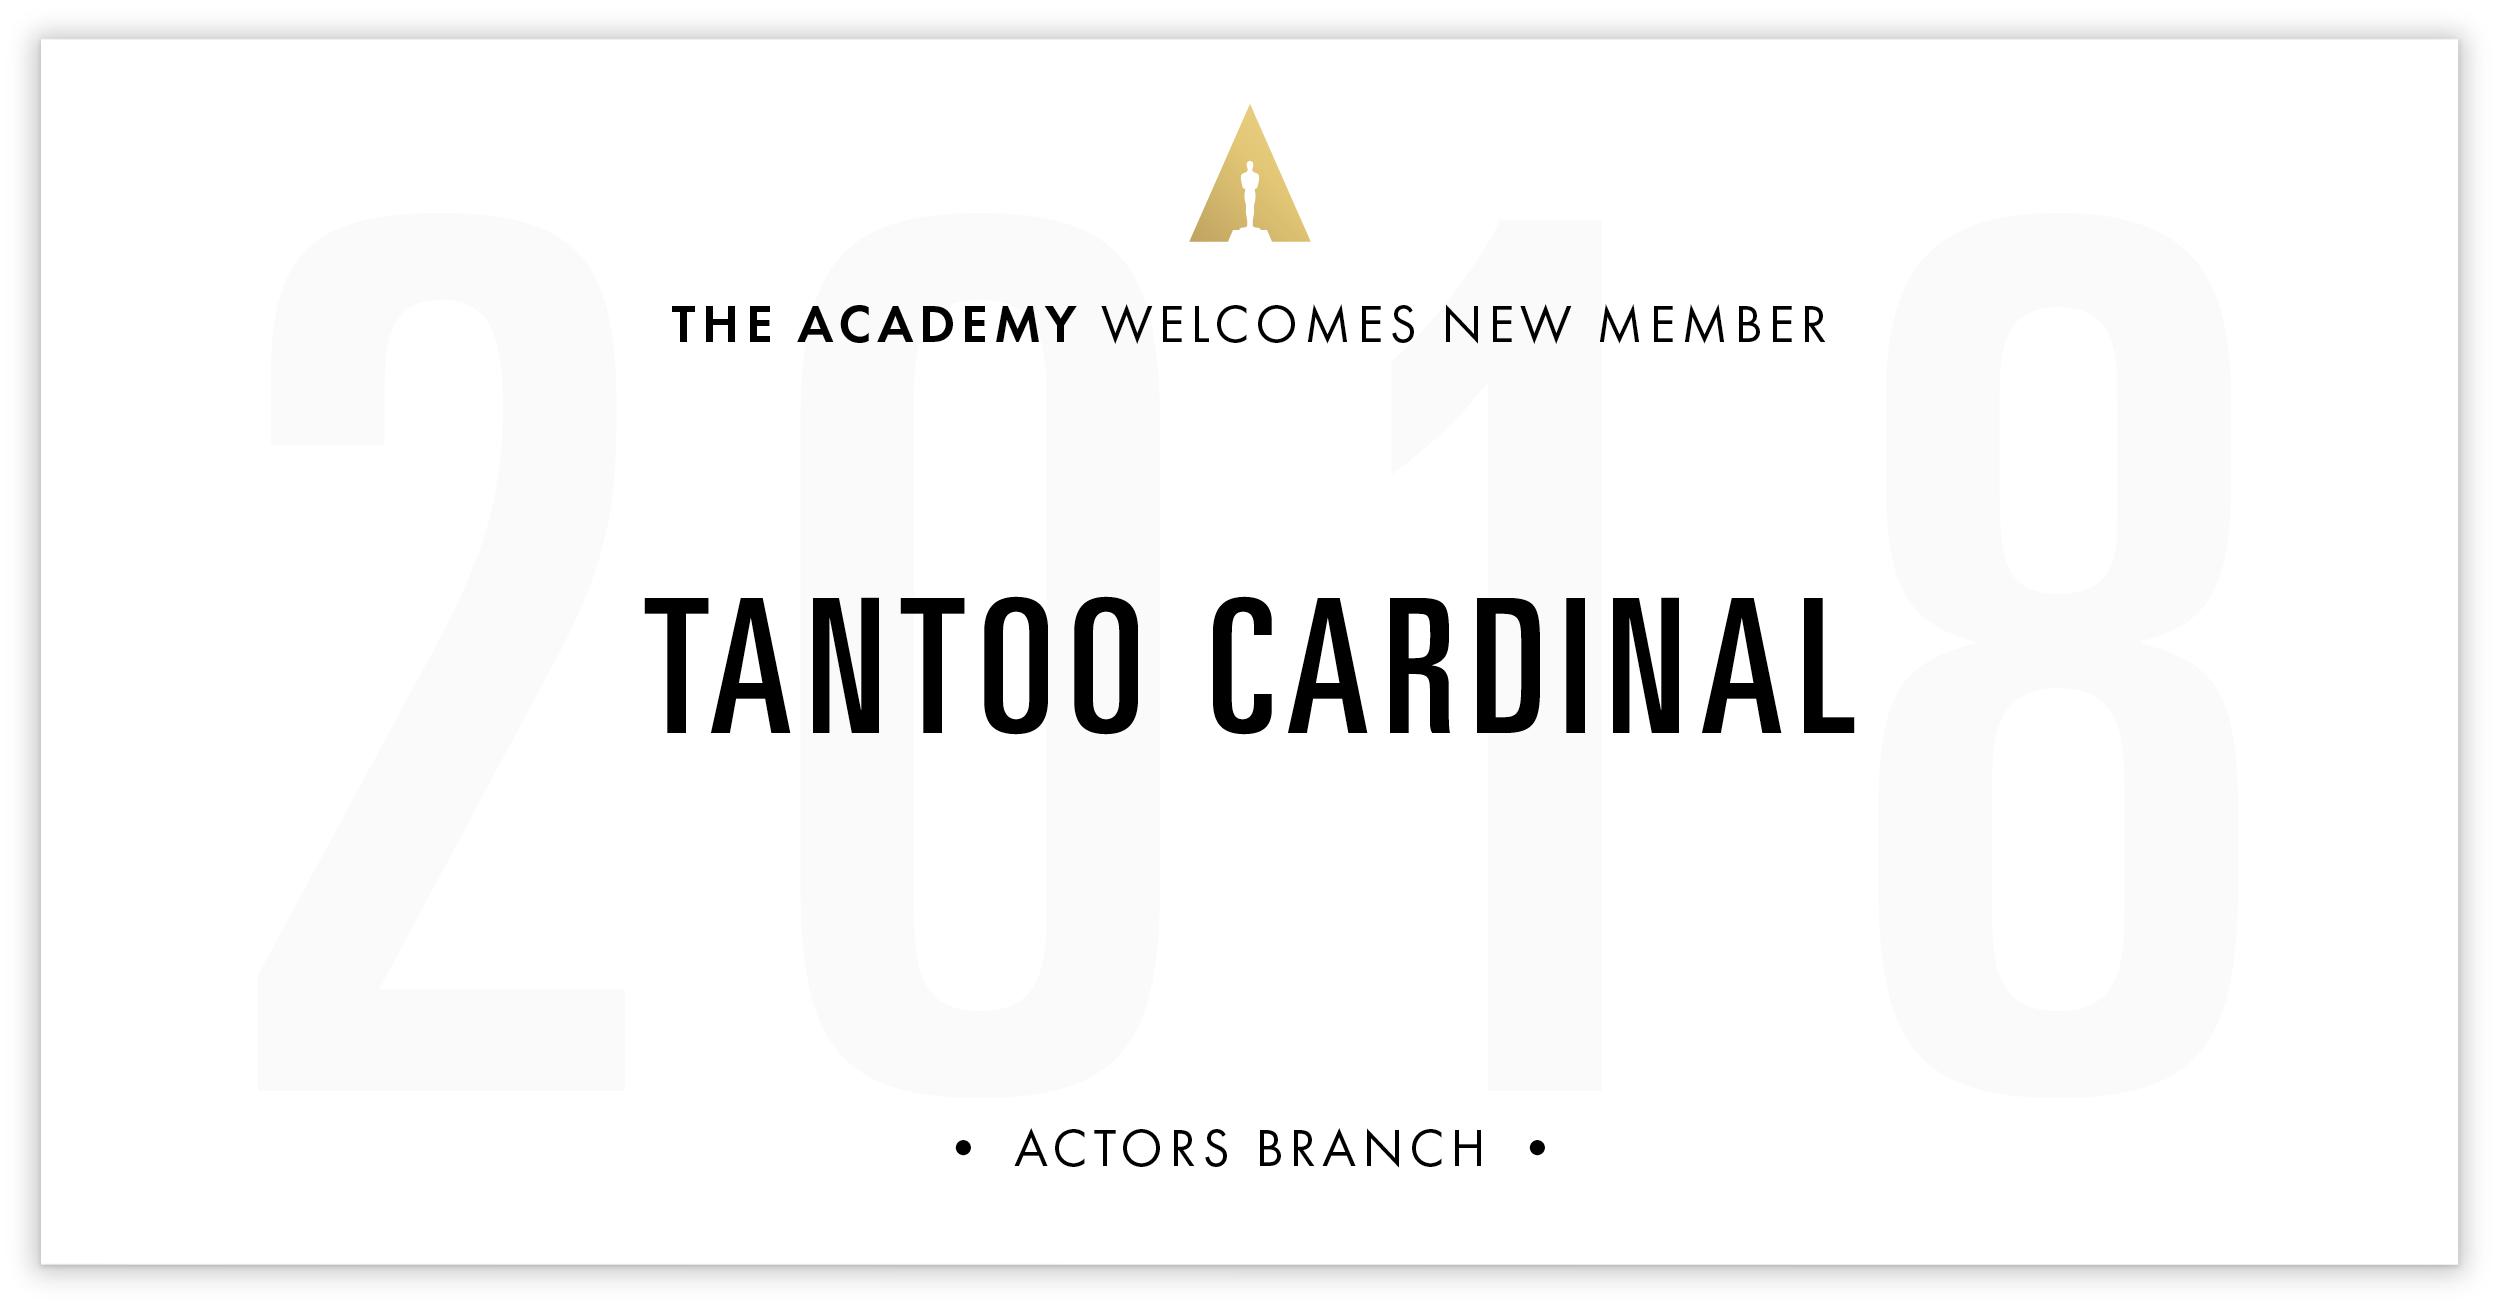 Tantoo Cardinal is invited!